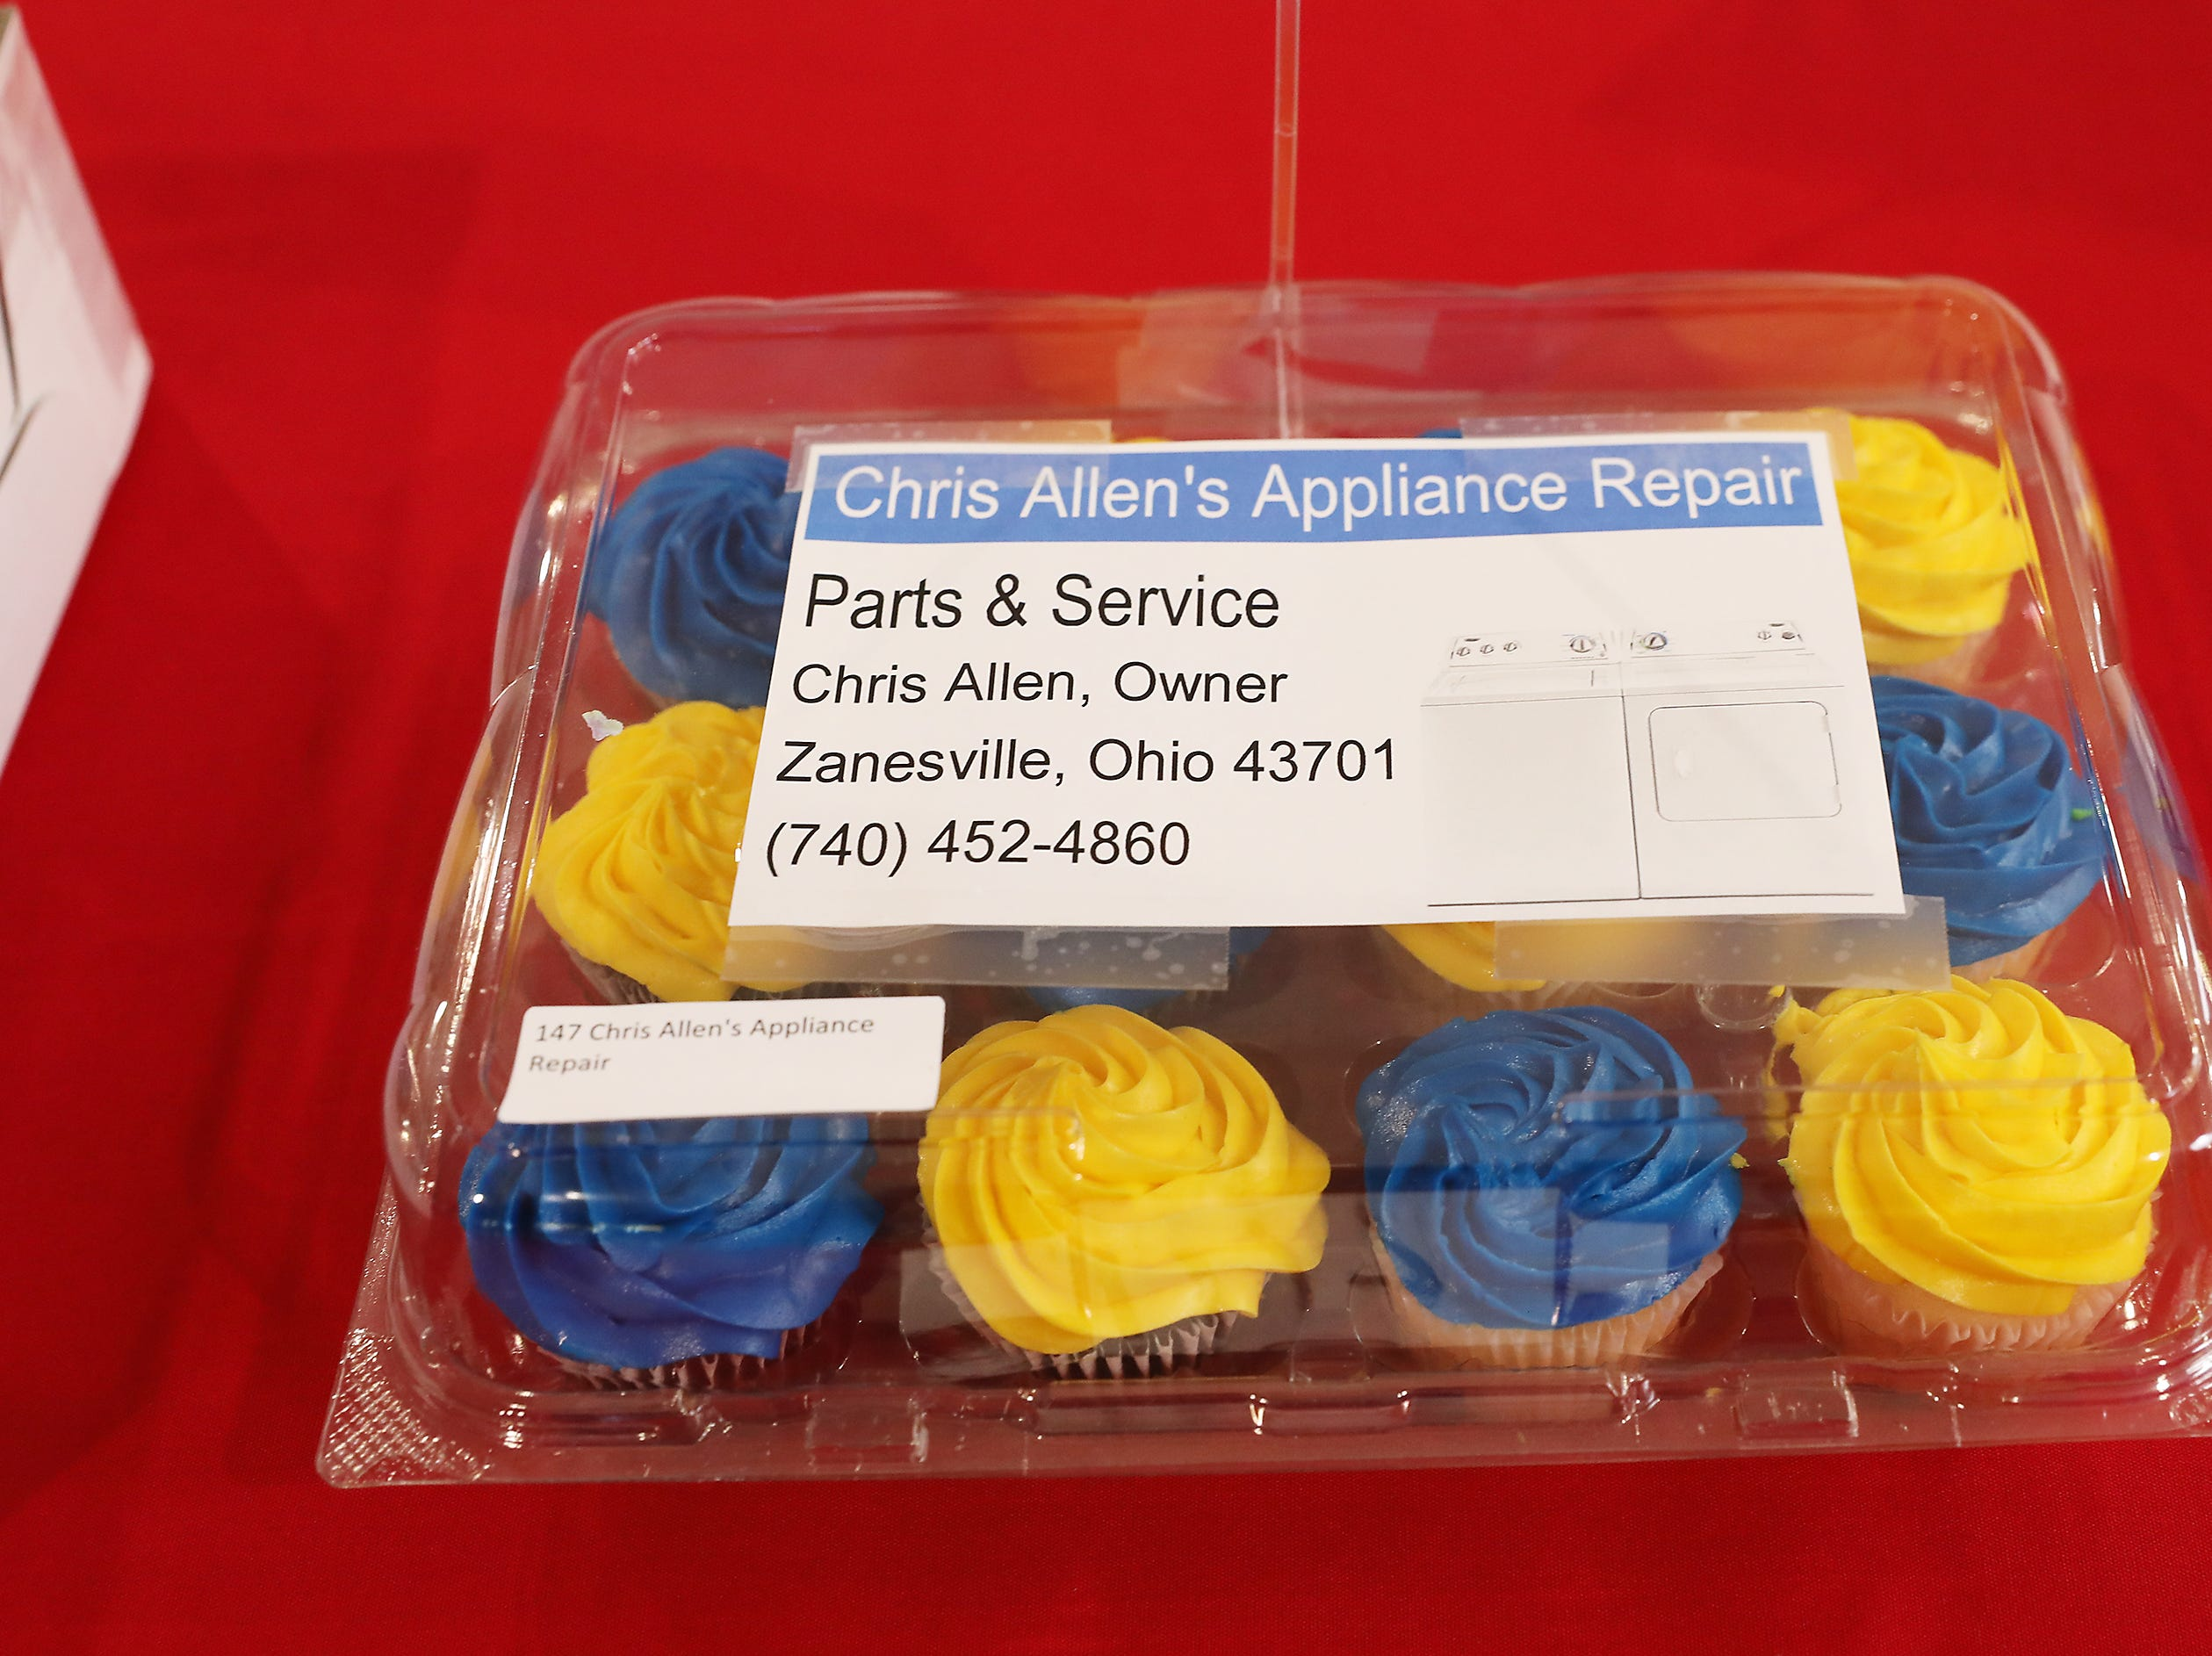 3:15 P.M. Thursday cake 147 Chris Allen's Appliance Repair - $30 Netflix gift card, $20 Domino's gift card, snack; $70